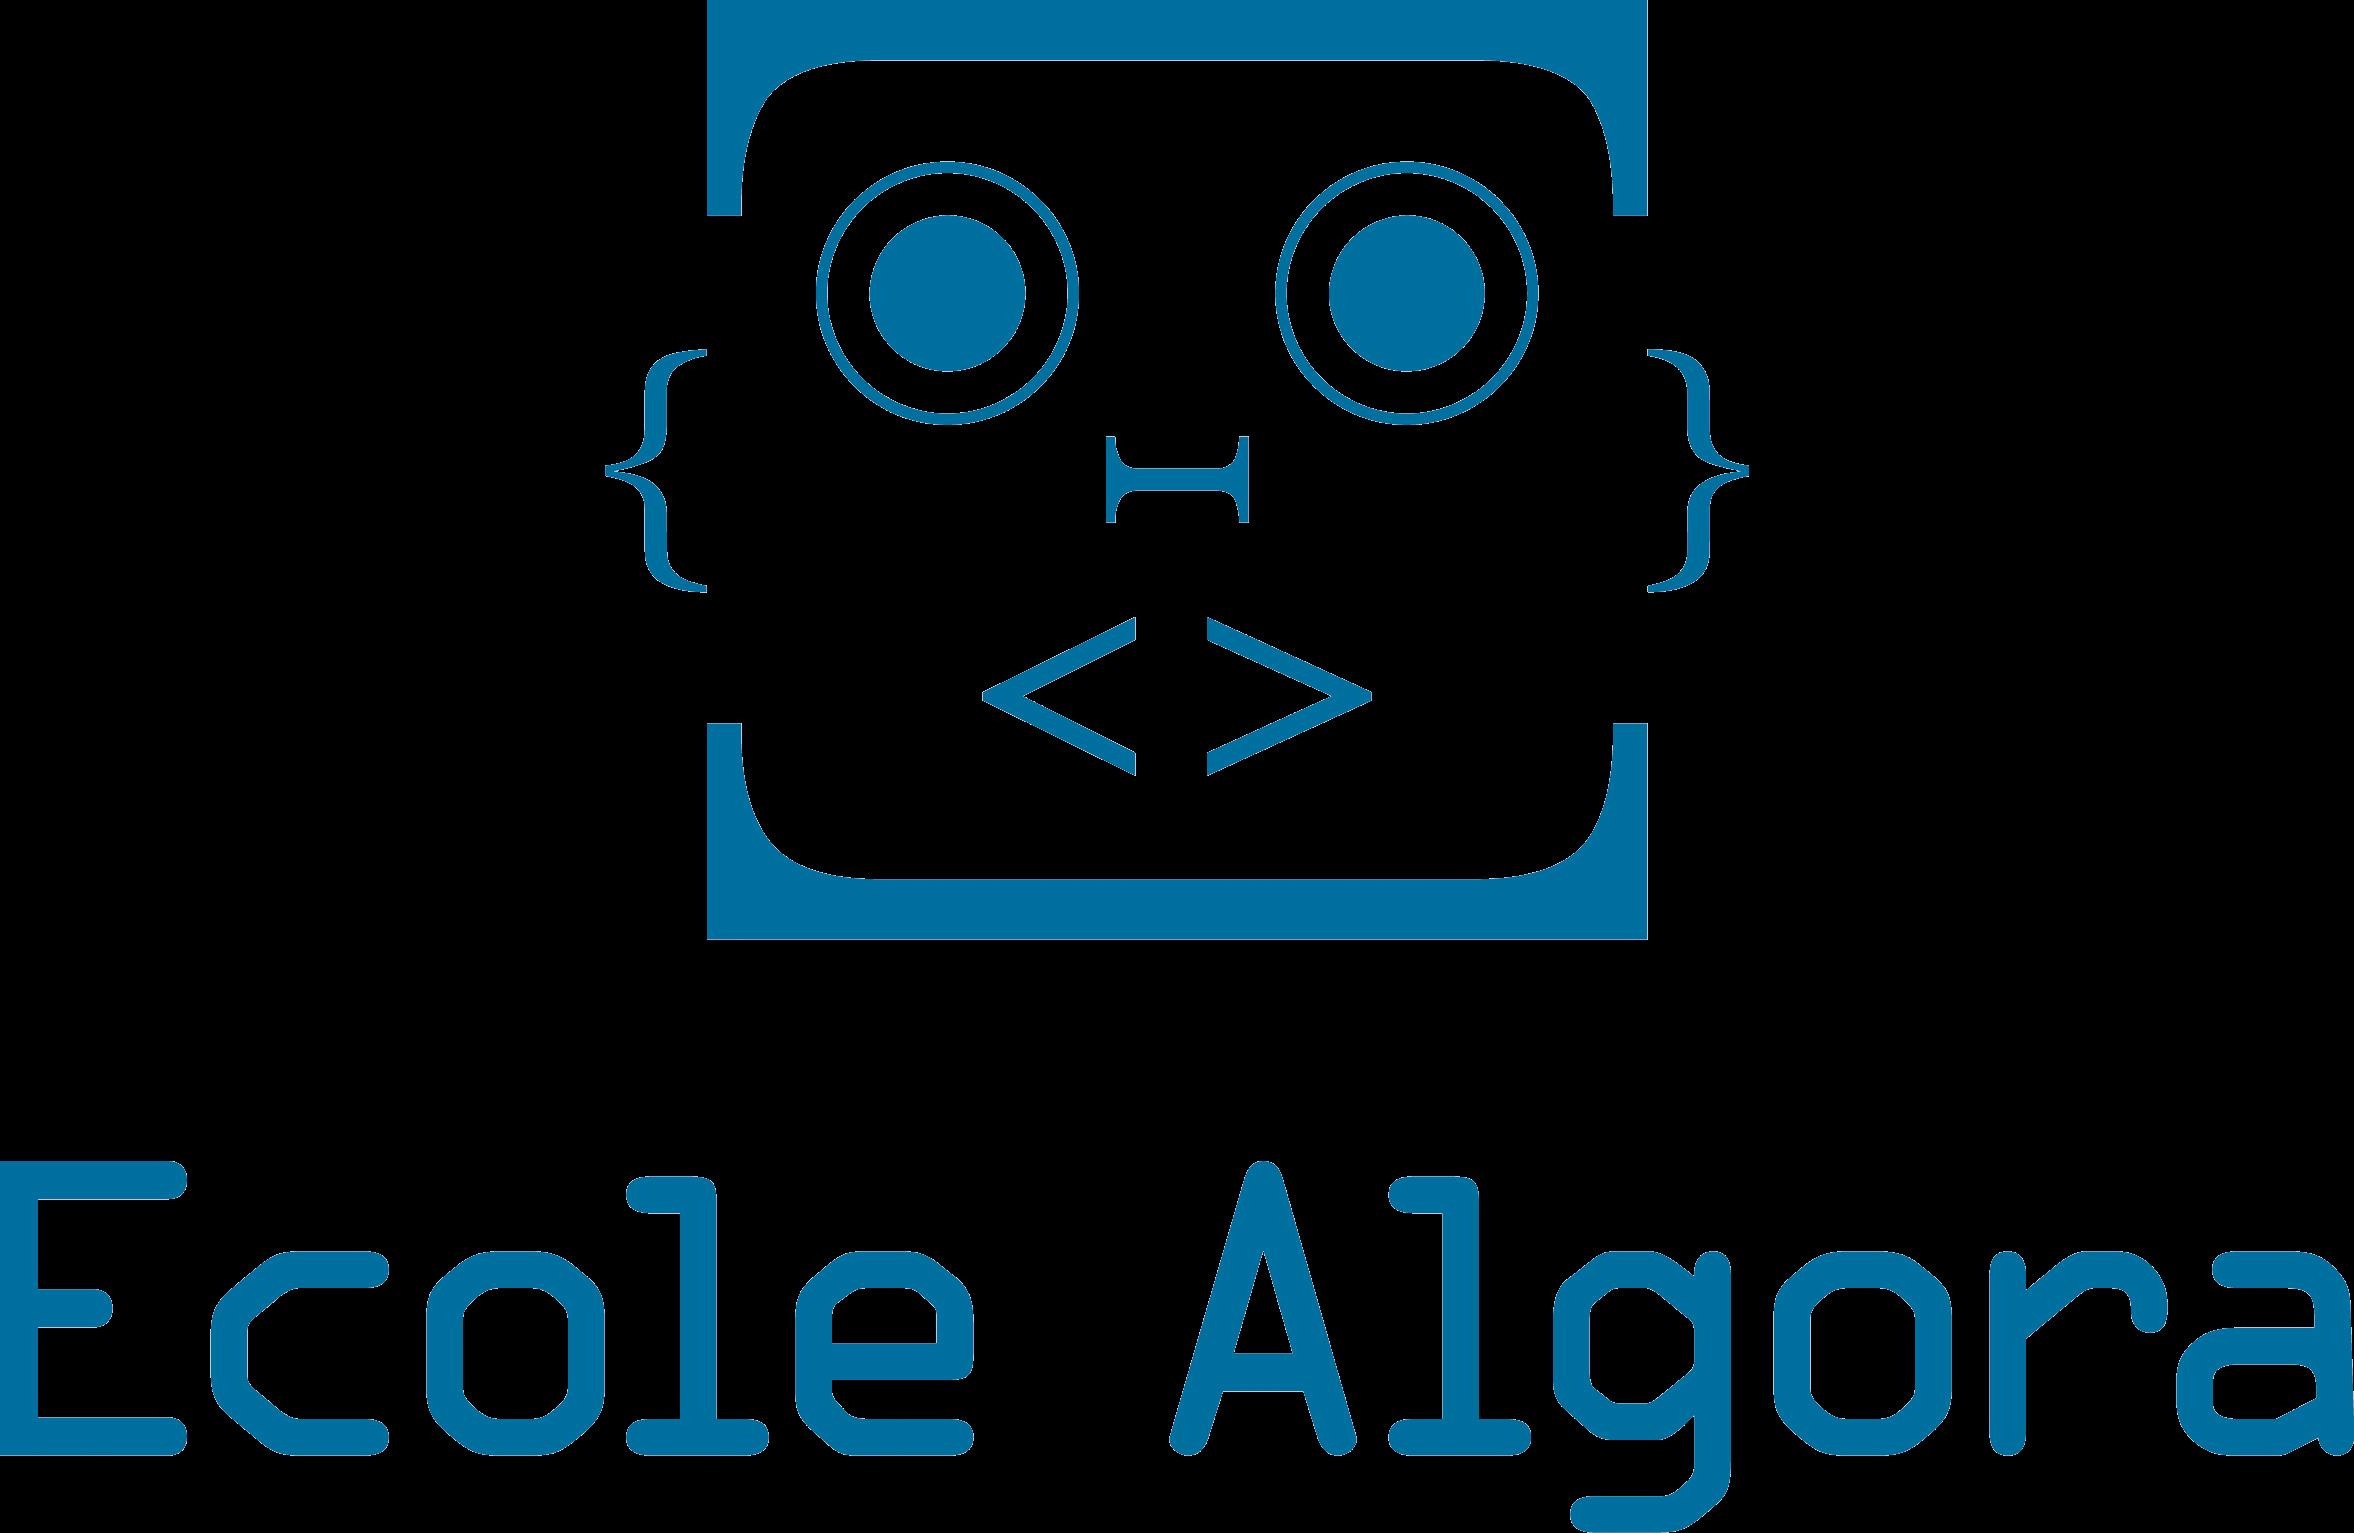 Ecole Algora